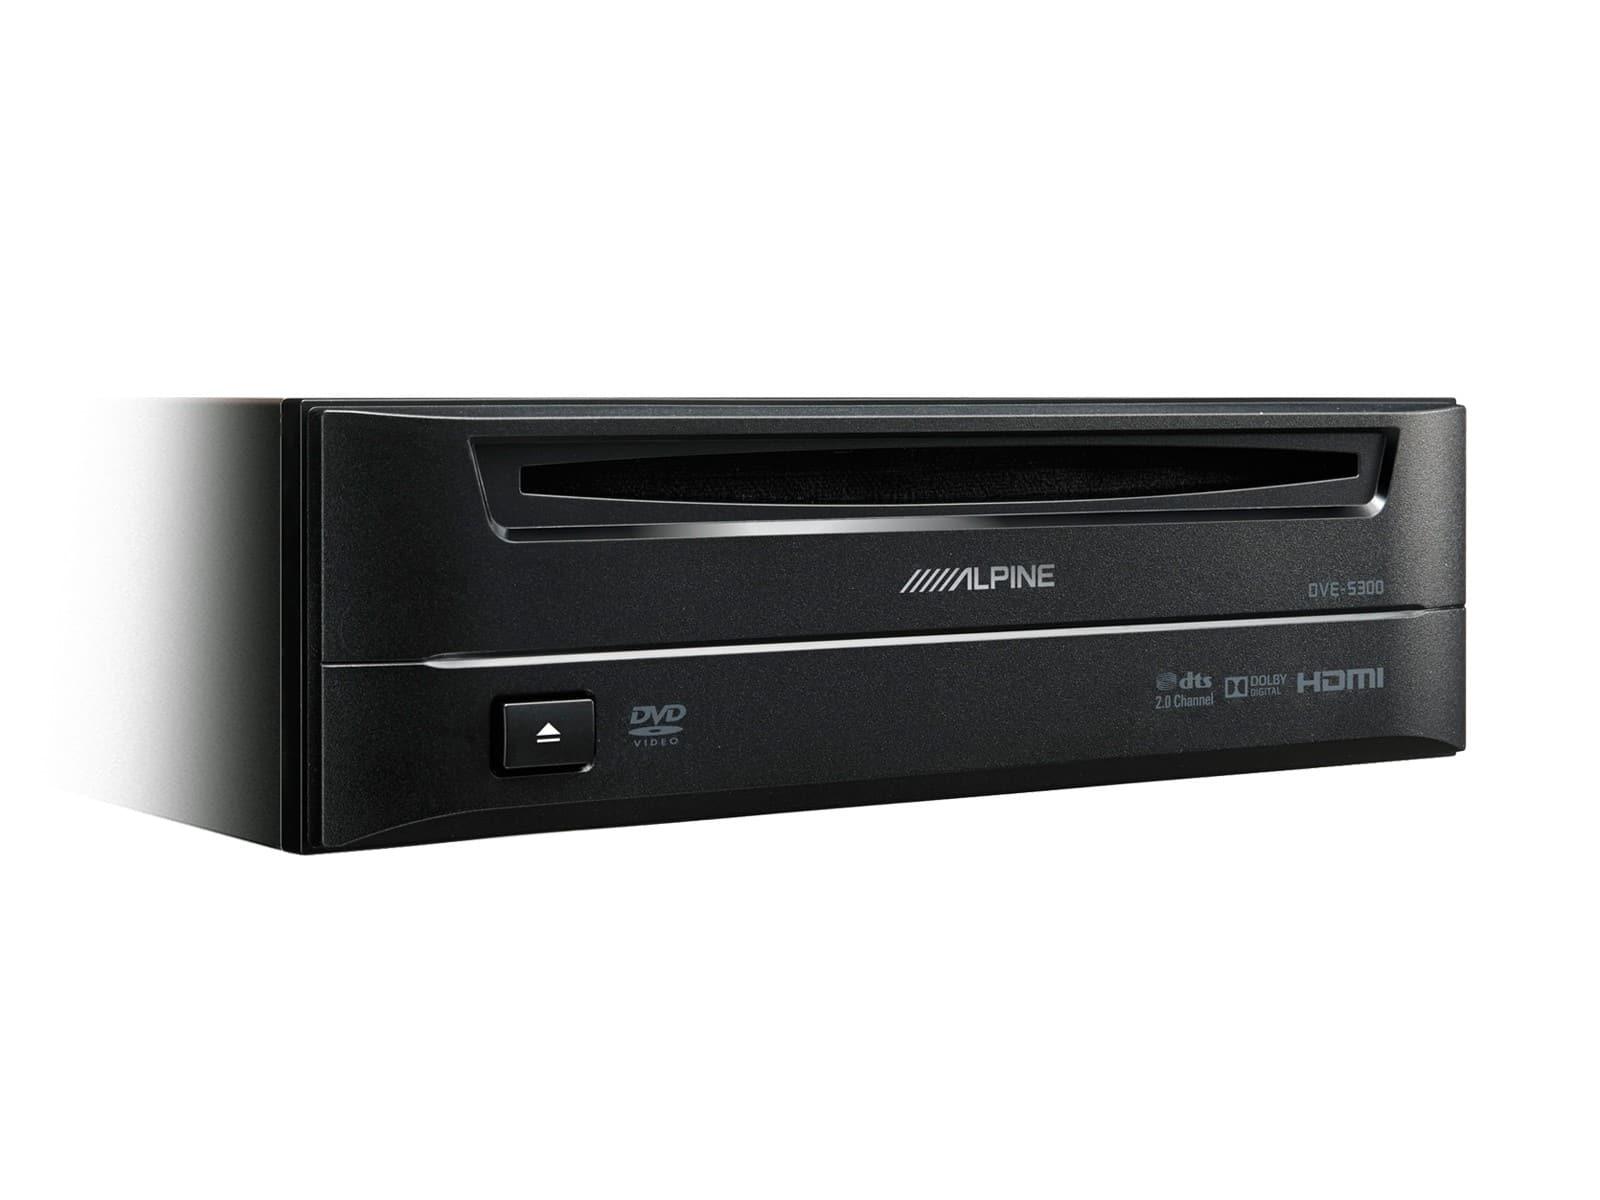 DVD-Player-DVE-5300-for-Volkswagen-Golf7-1200×900